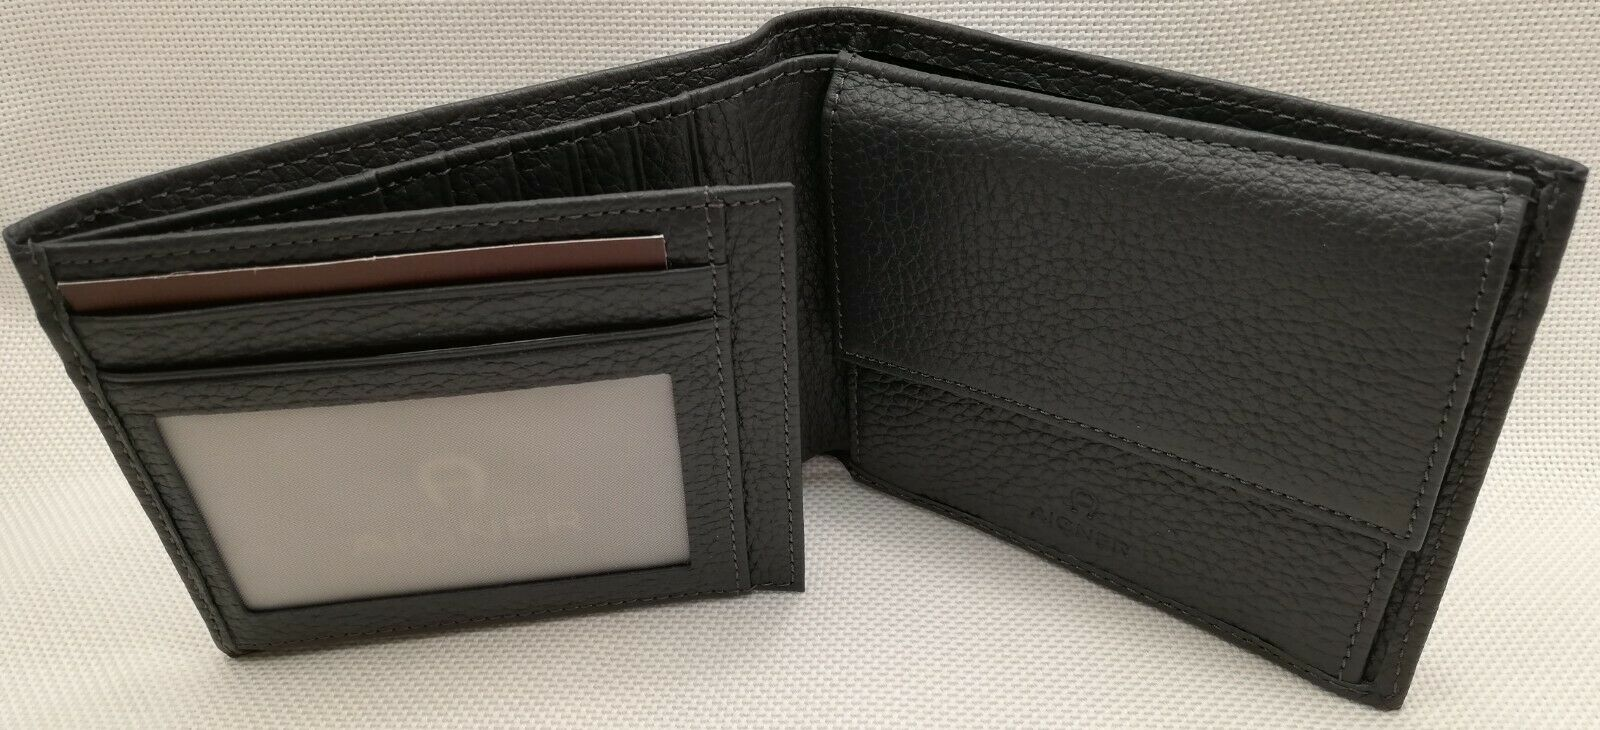 Aigner Herren Geldbörse Portemonnaie Leder grau schwarz - große Kombigeldbörse